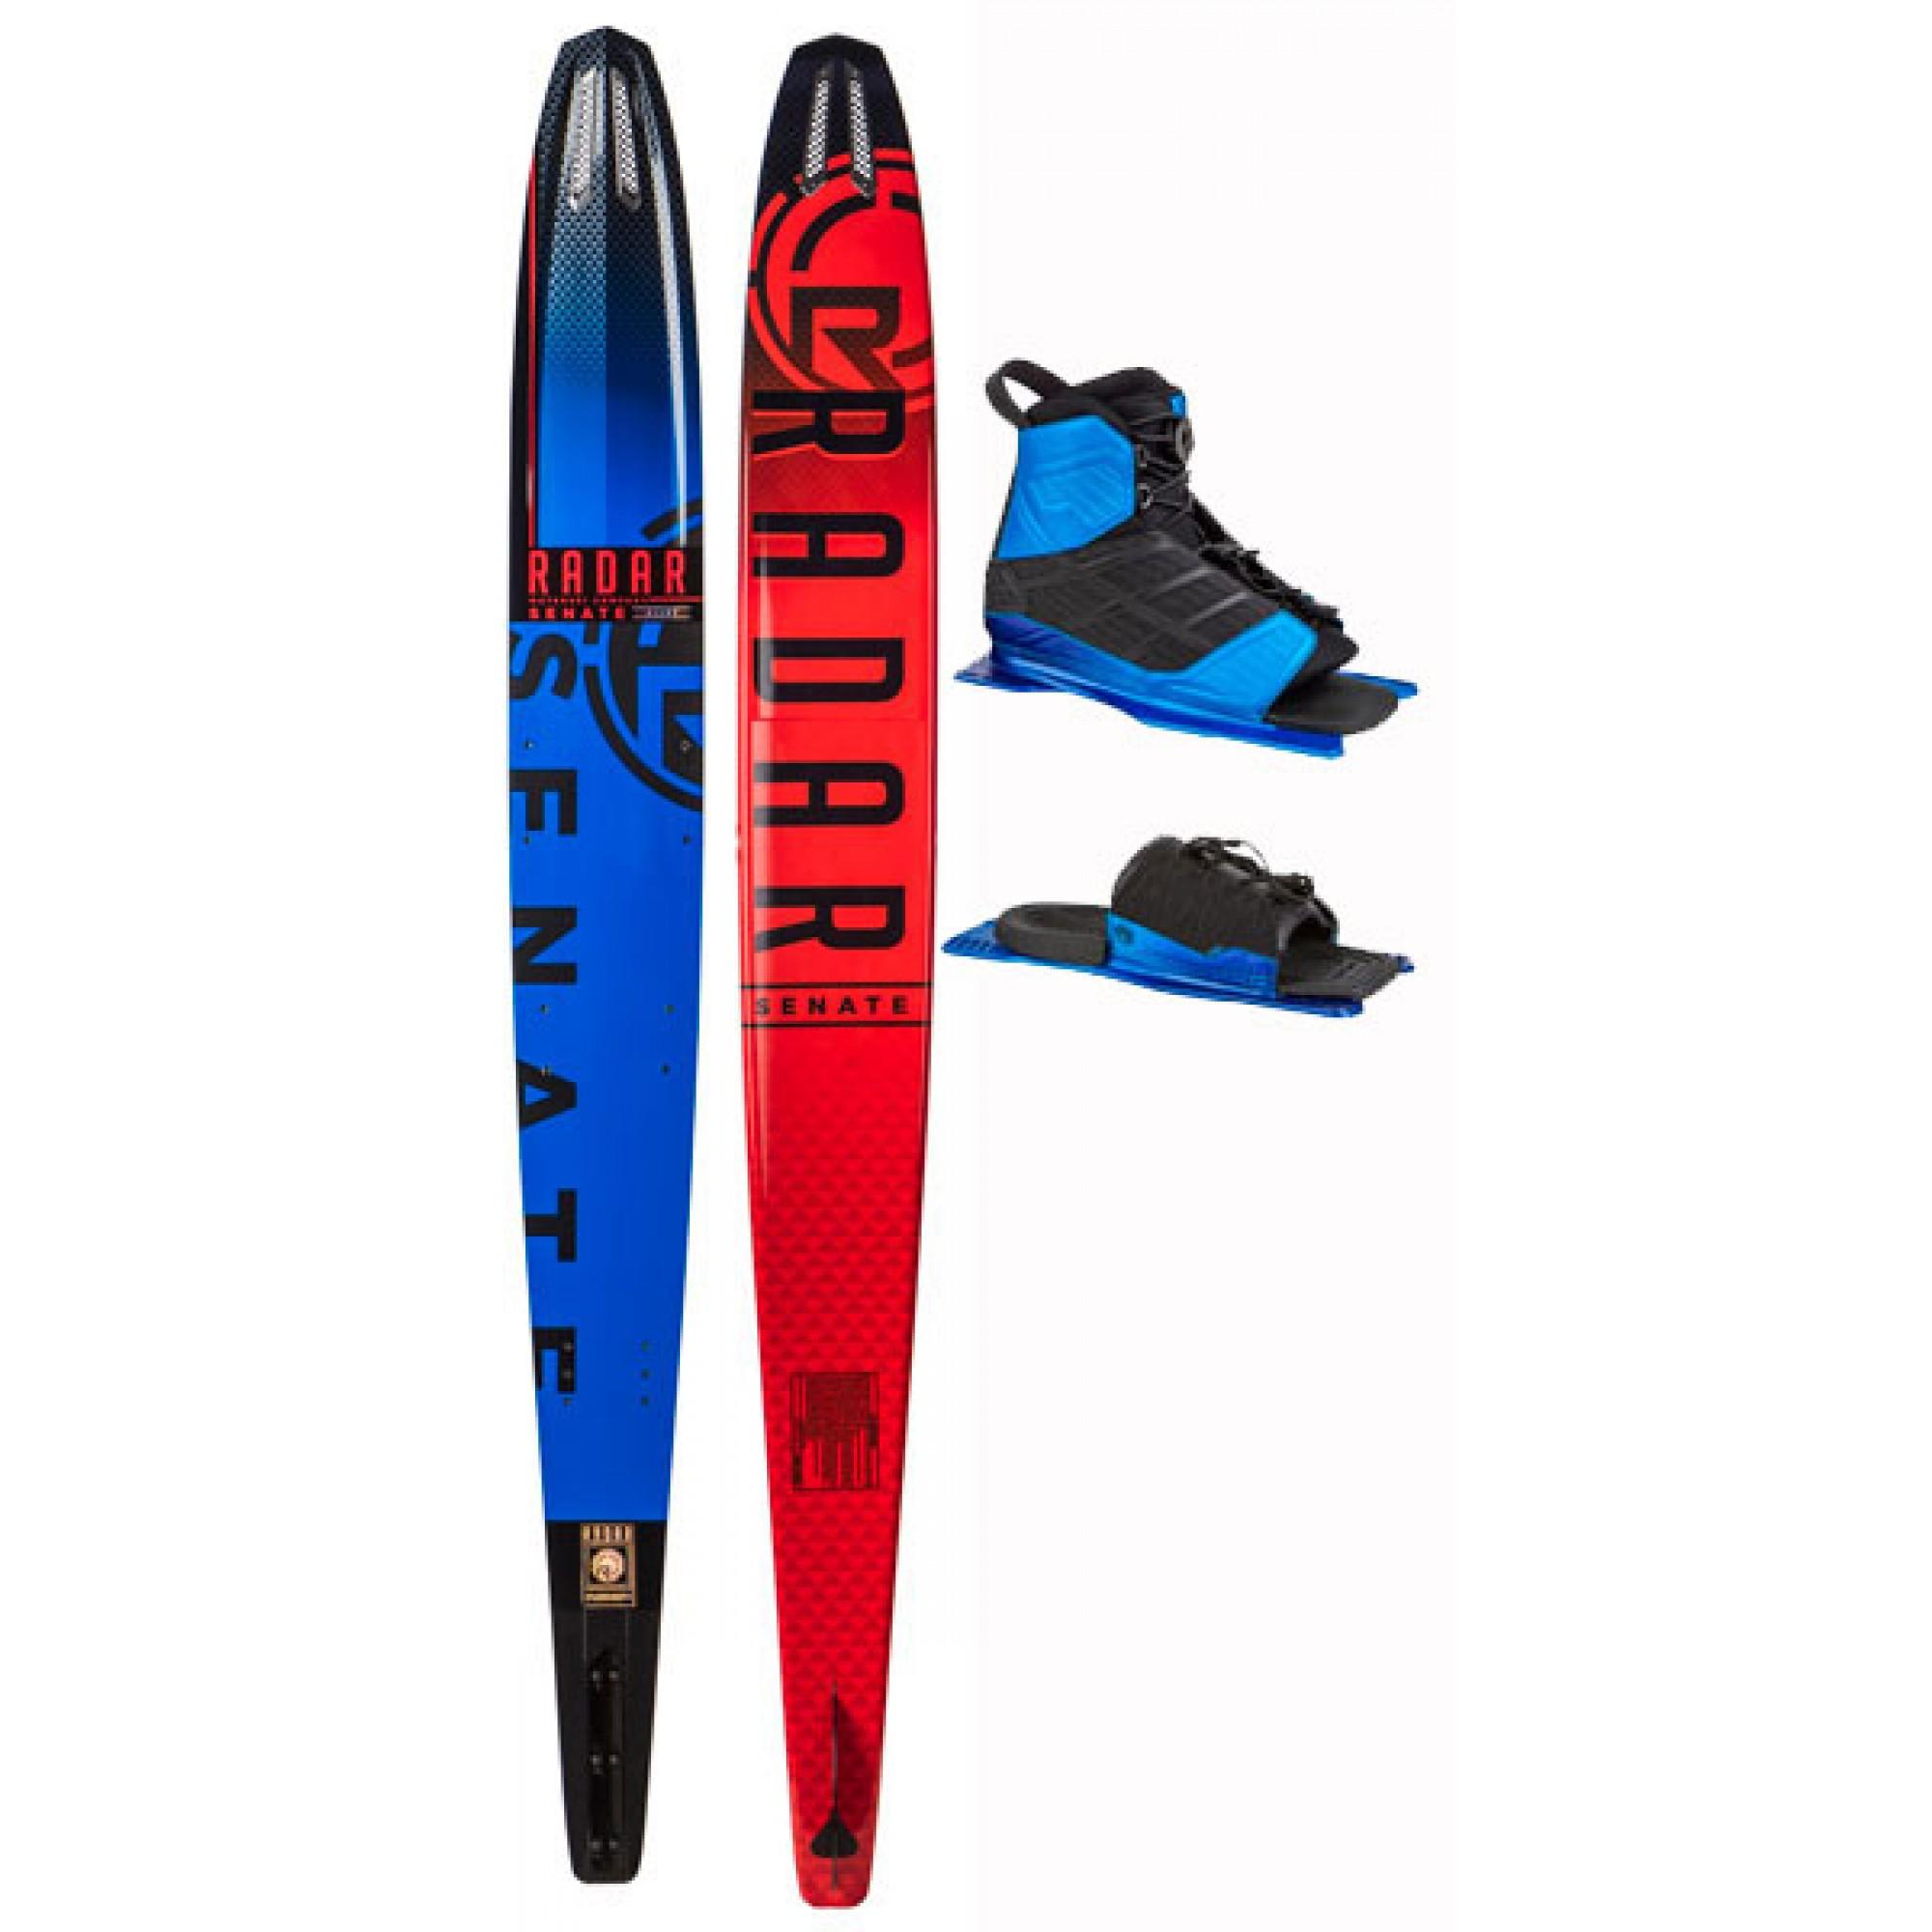 Radar Senate Alloy Slalom Ski with Vector Boots